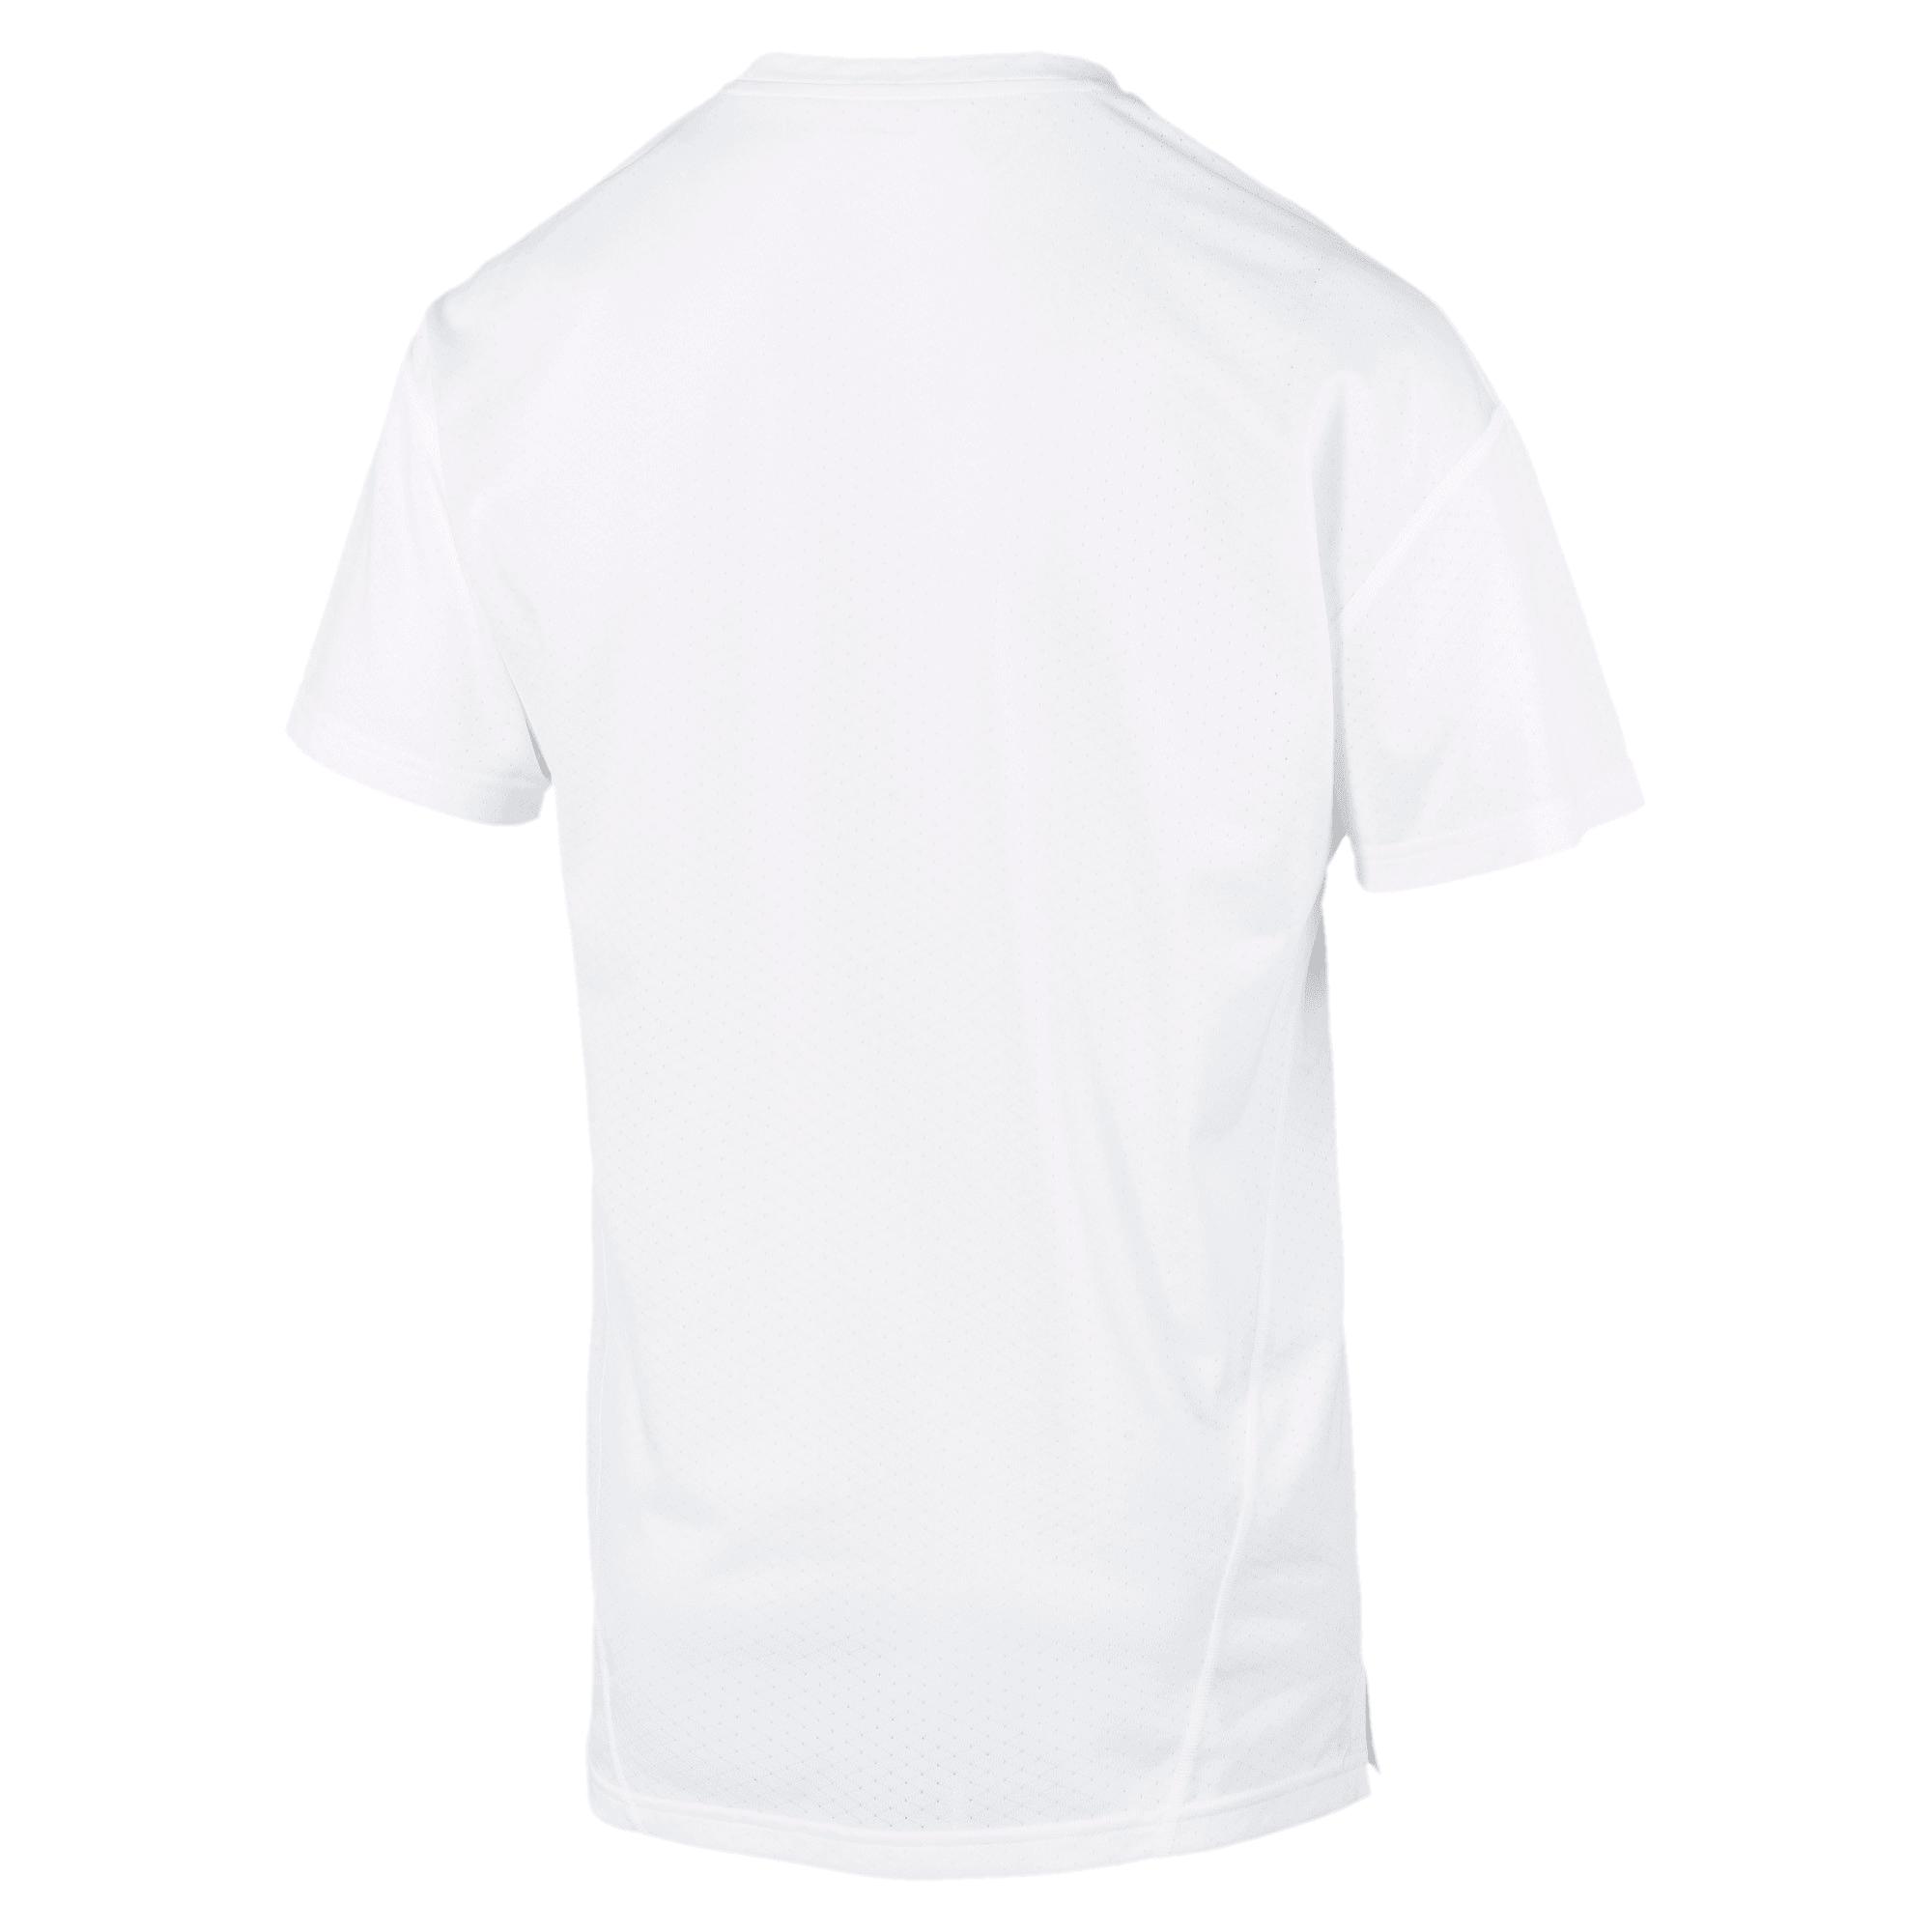 Thumbnail 6 of A.C.E. Herren Trainingsshirt, Puma White, medium